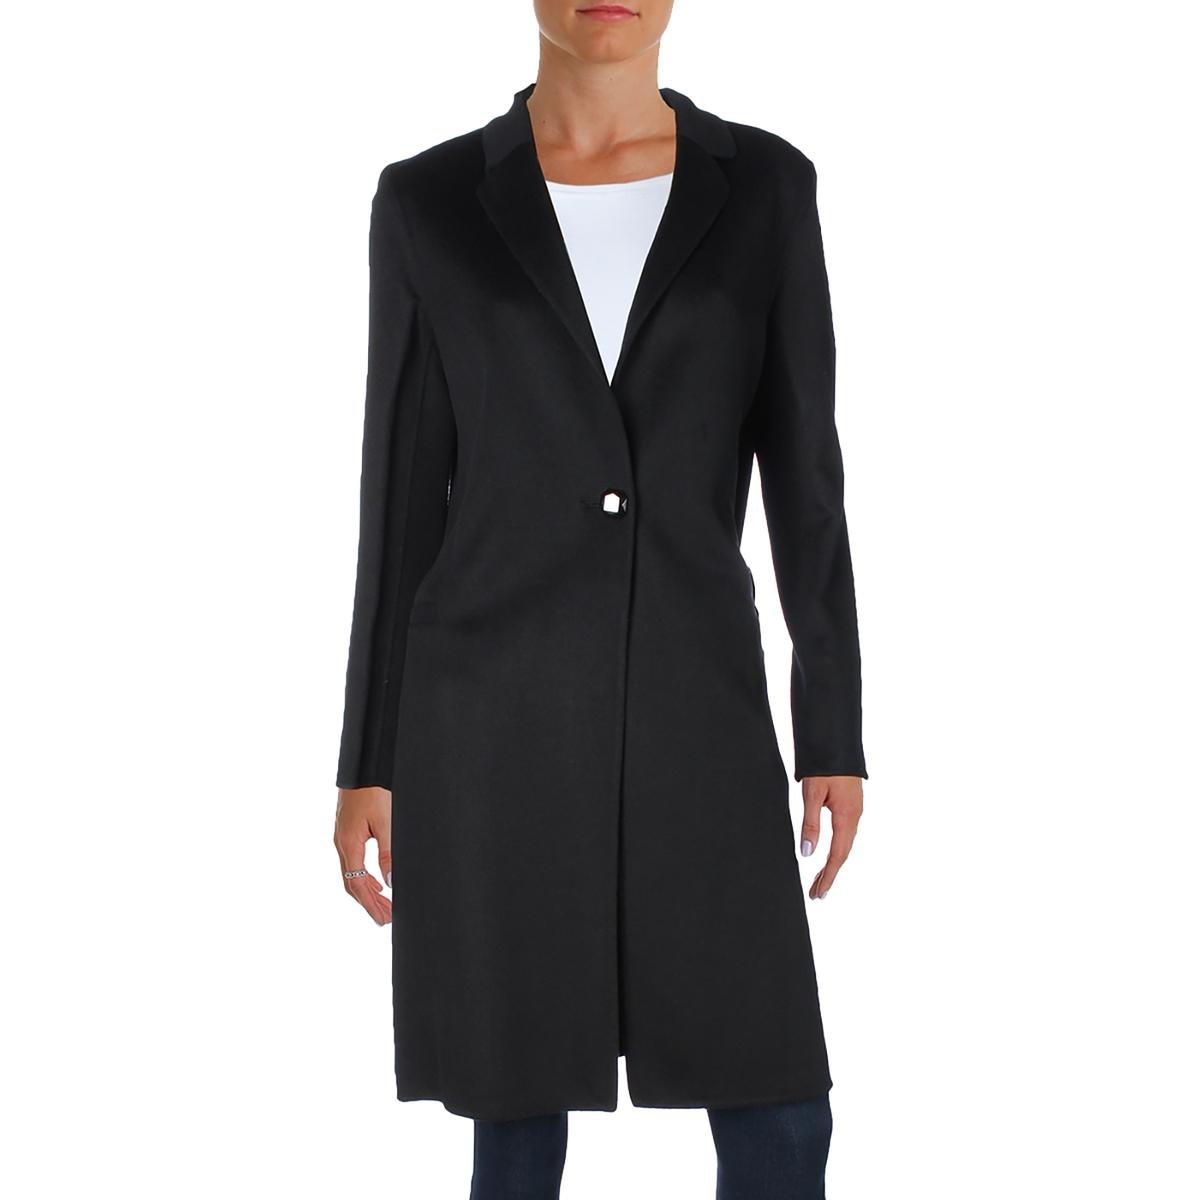 Nanette Lepore Women's Elegant Double Faced Single Breasted Wool Blend Coat, Black, Small